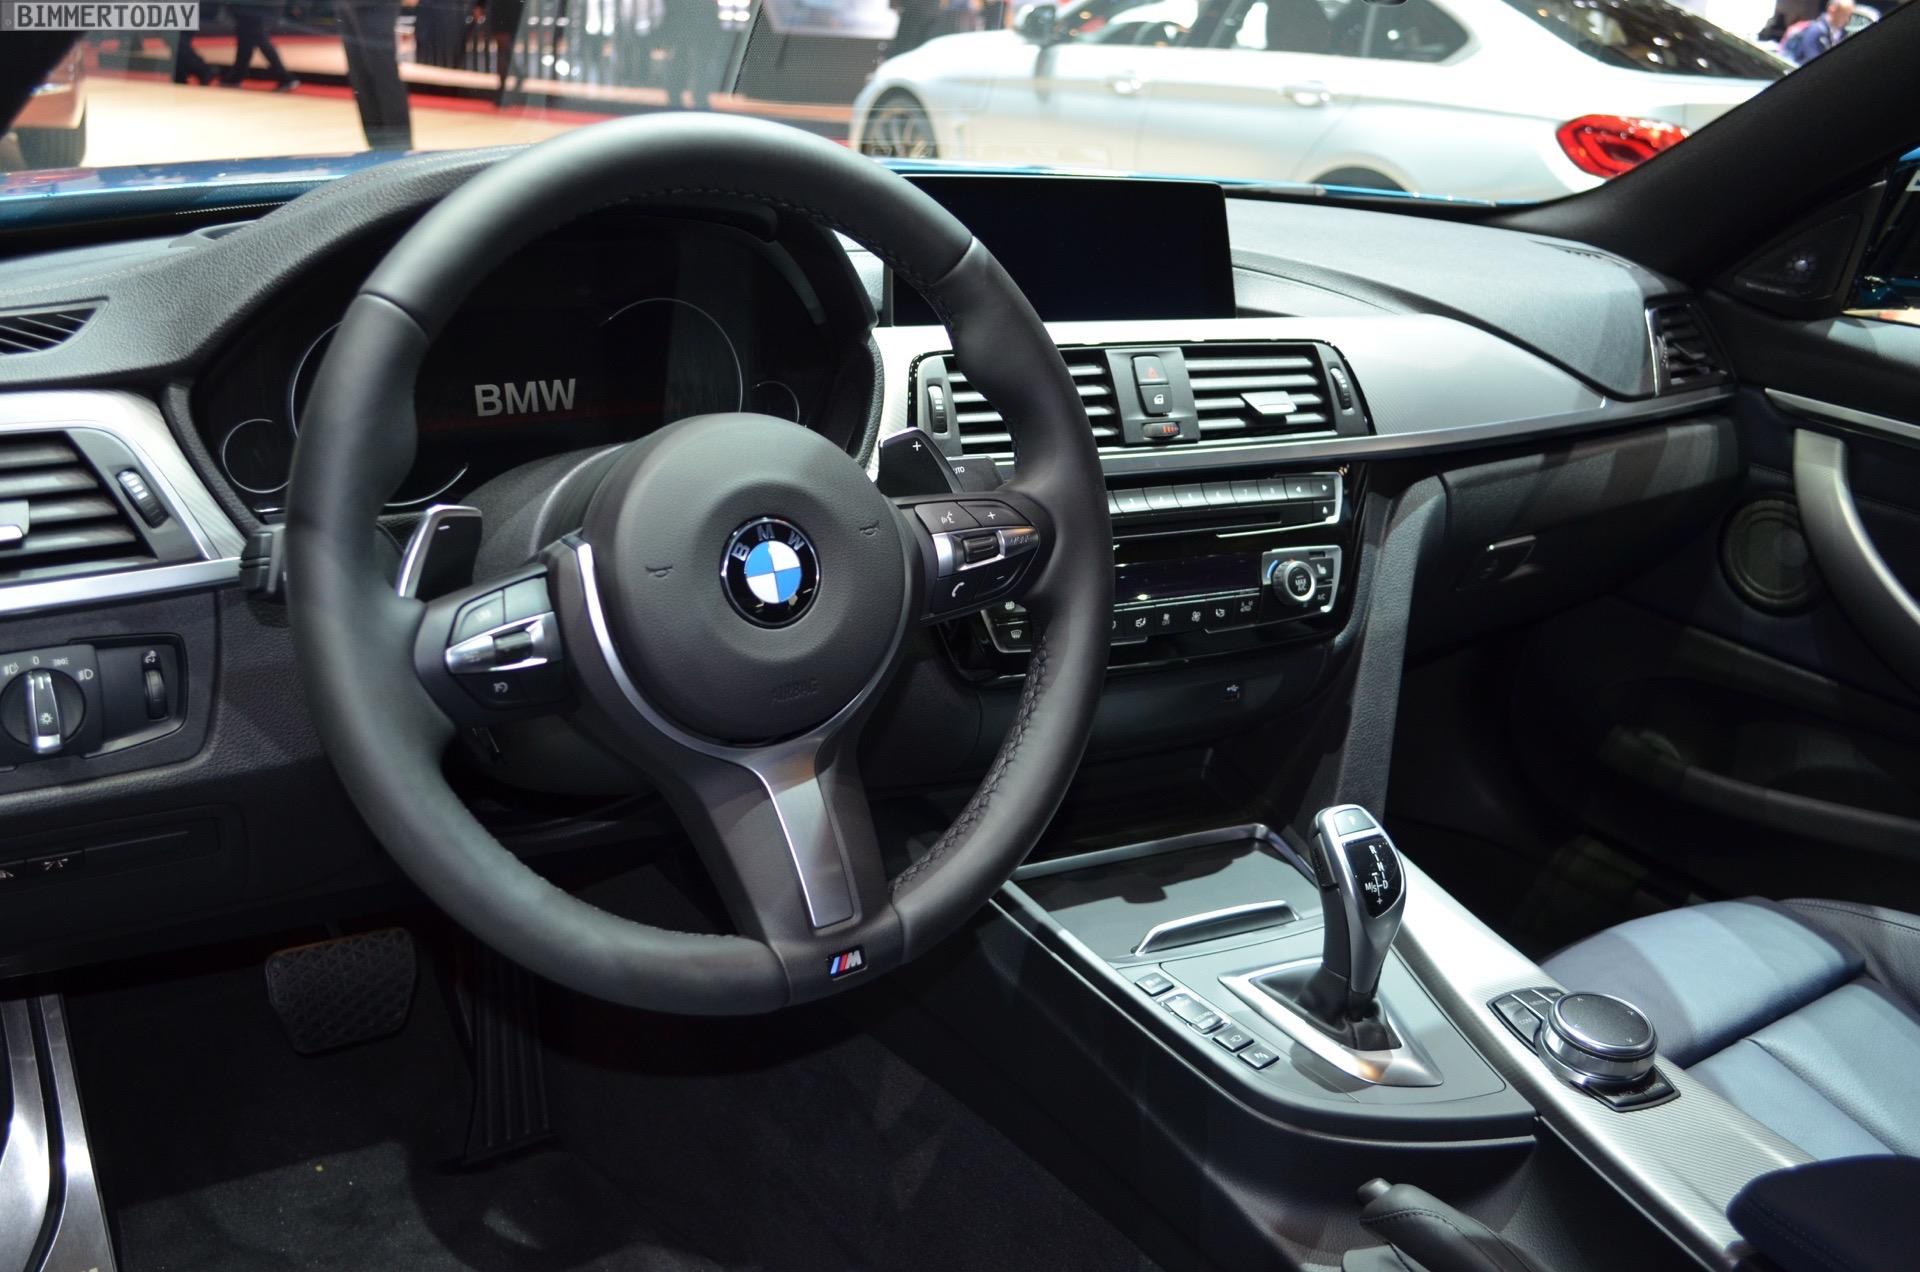 2017 Geneva Bmw 440i Facelift In Snapper Rocks Blue